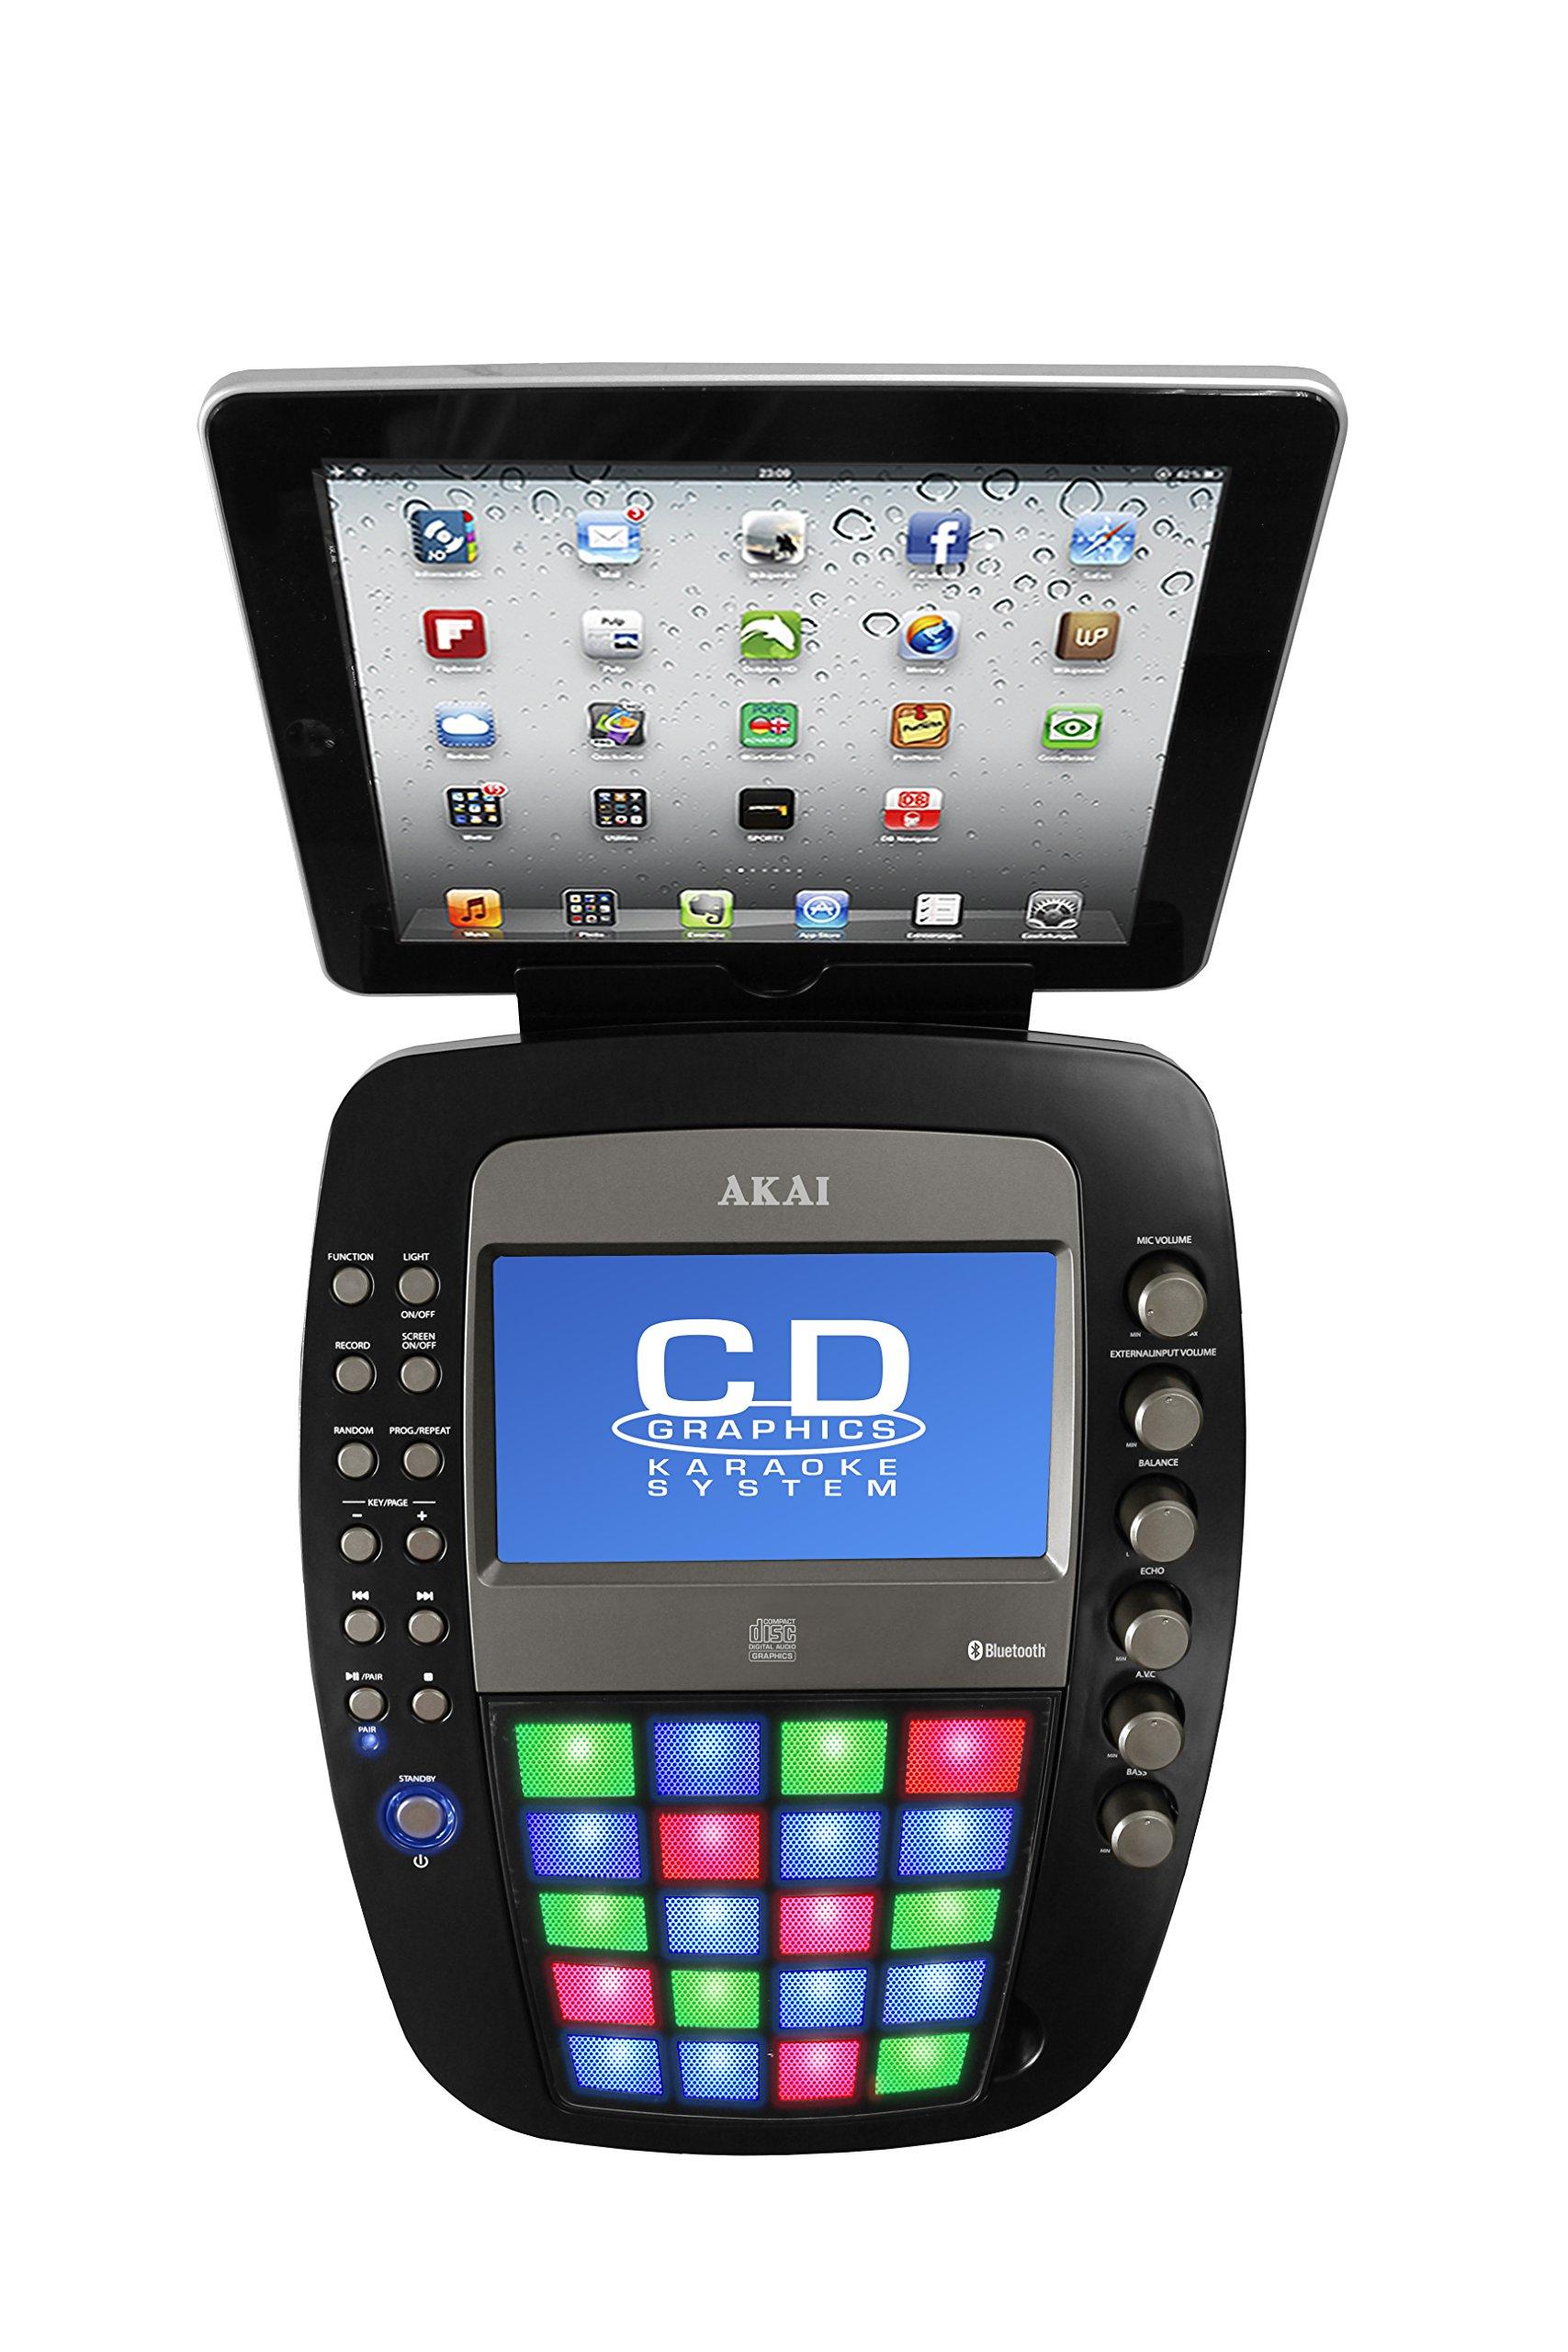 Akai KS878-BT Bluetooth Pedestal CD&G Karaoke System, Black by Akai (Image #3)